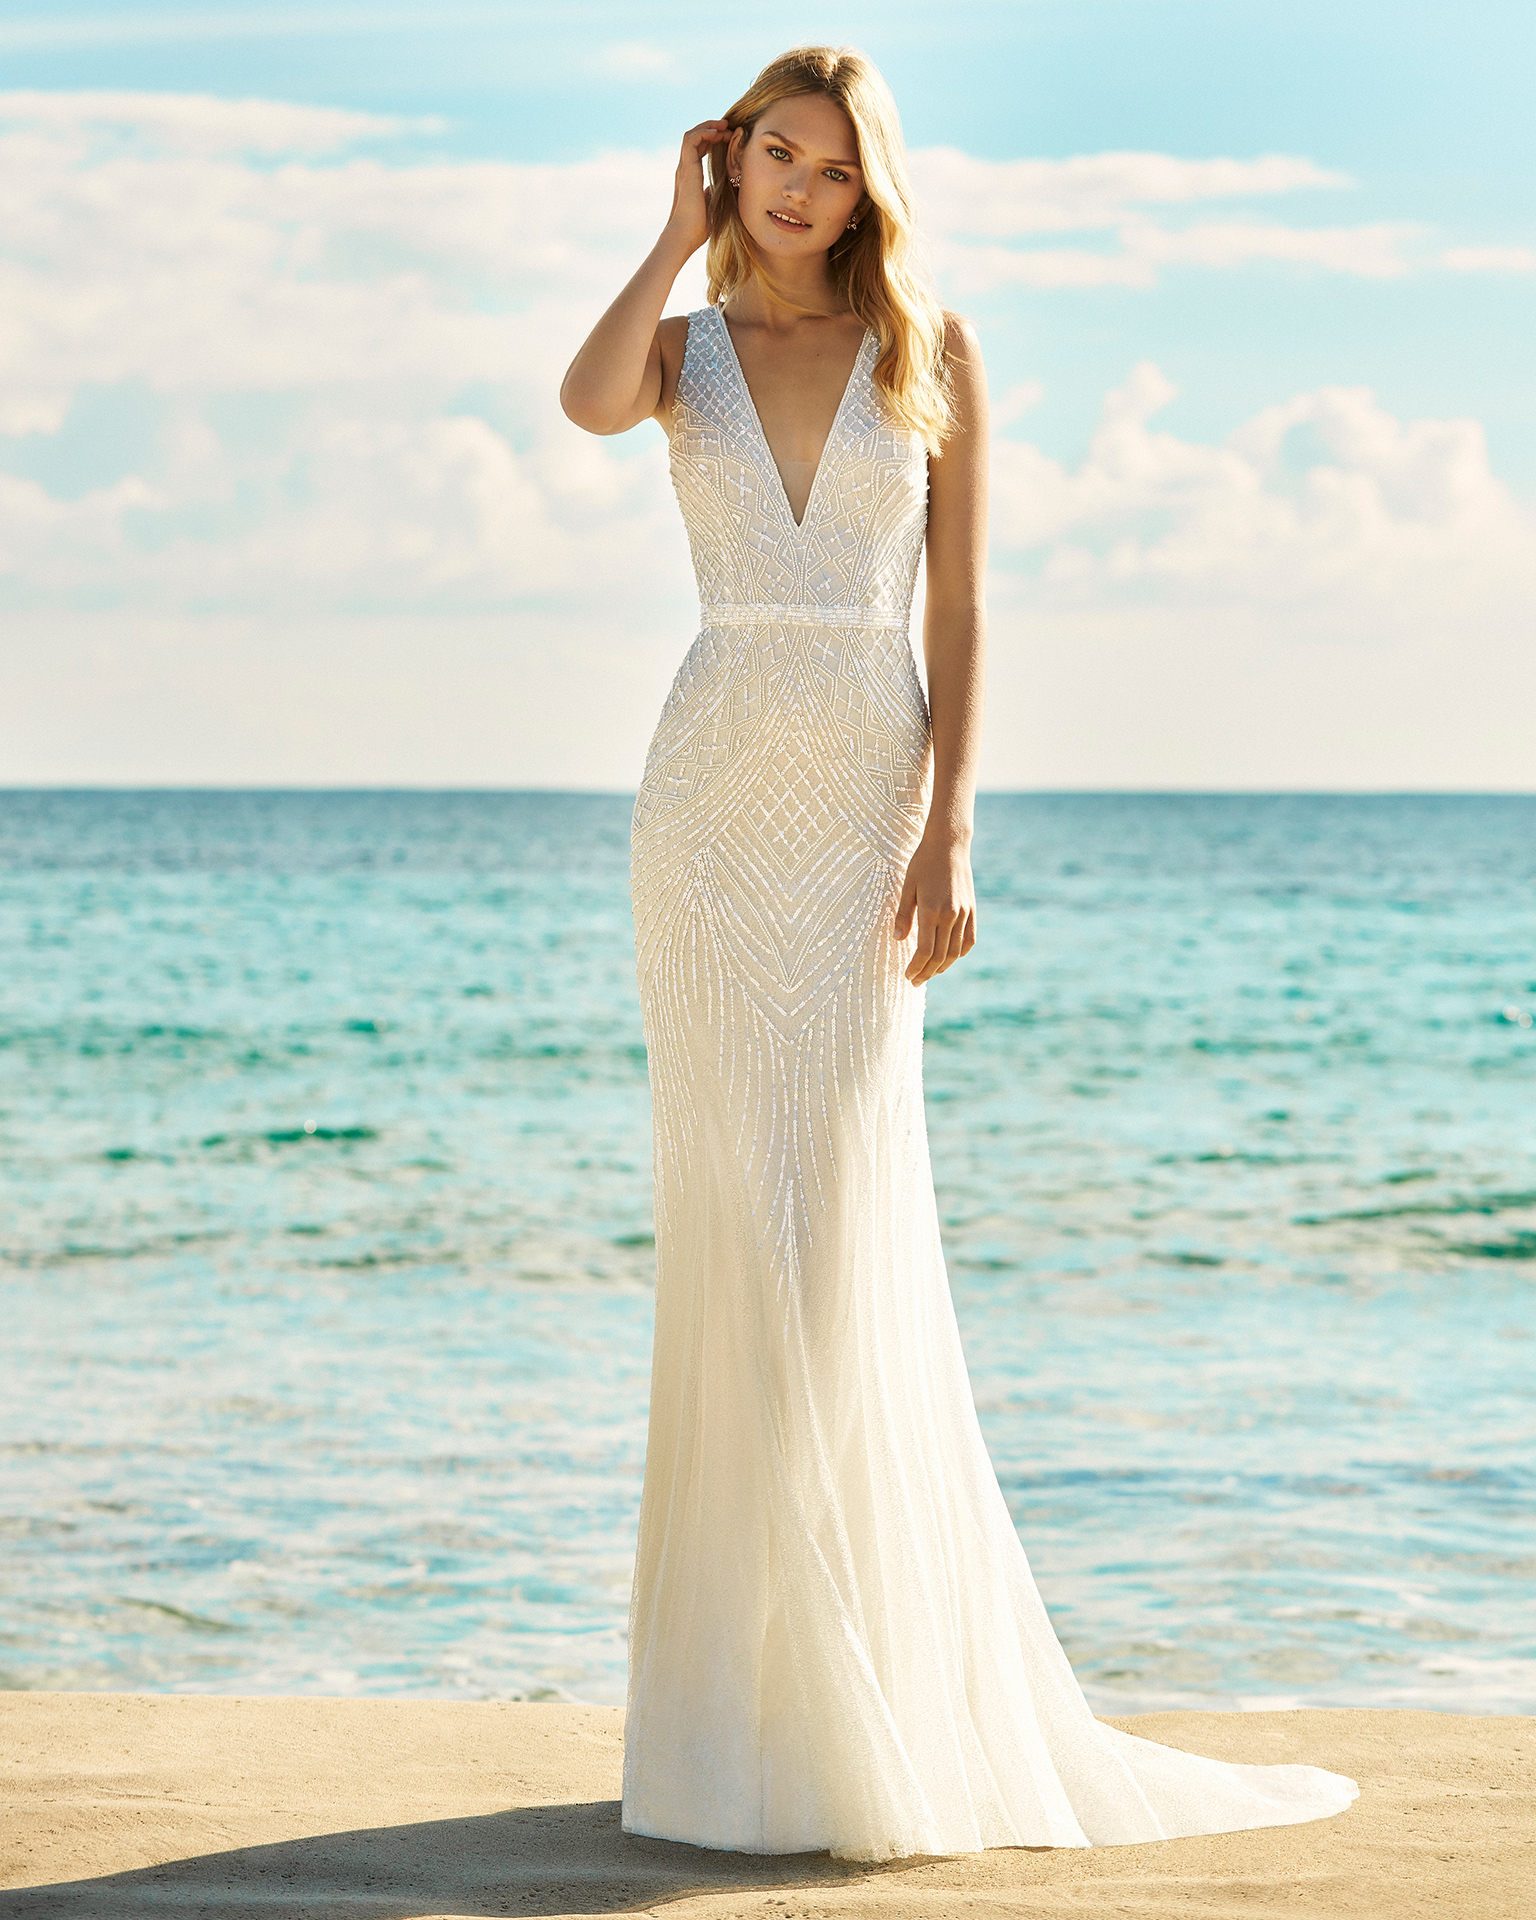 Bridal 2019. AIRE BEACH WEDDING Collection